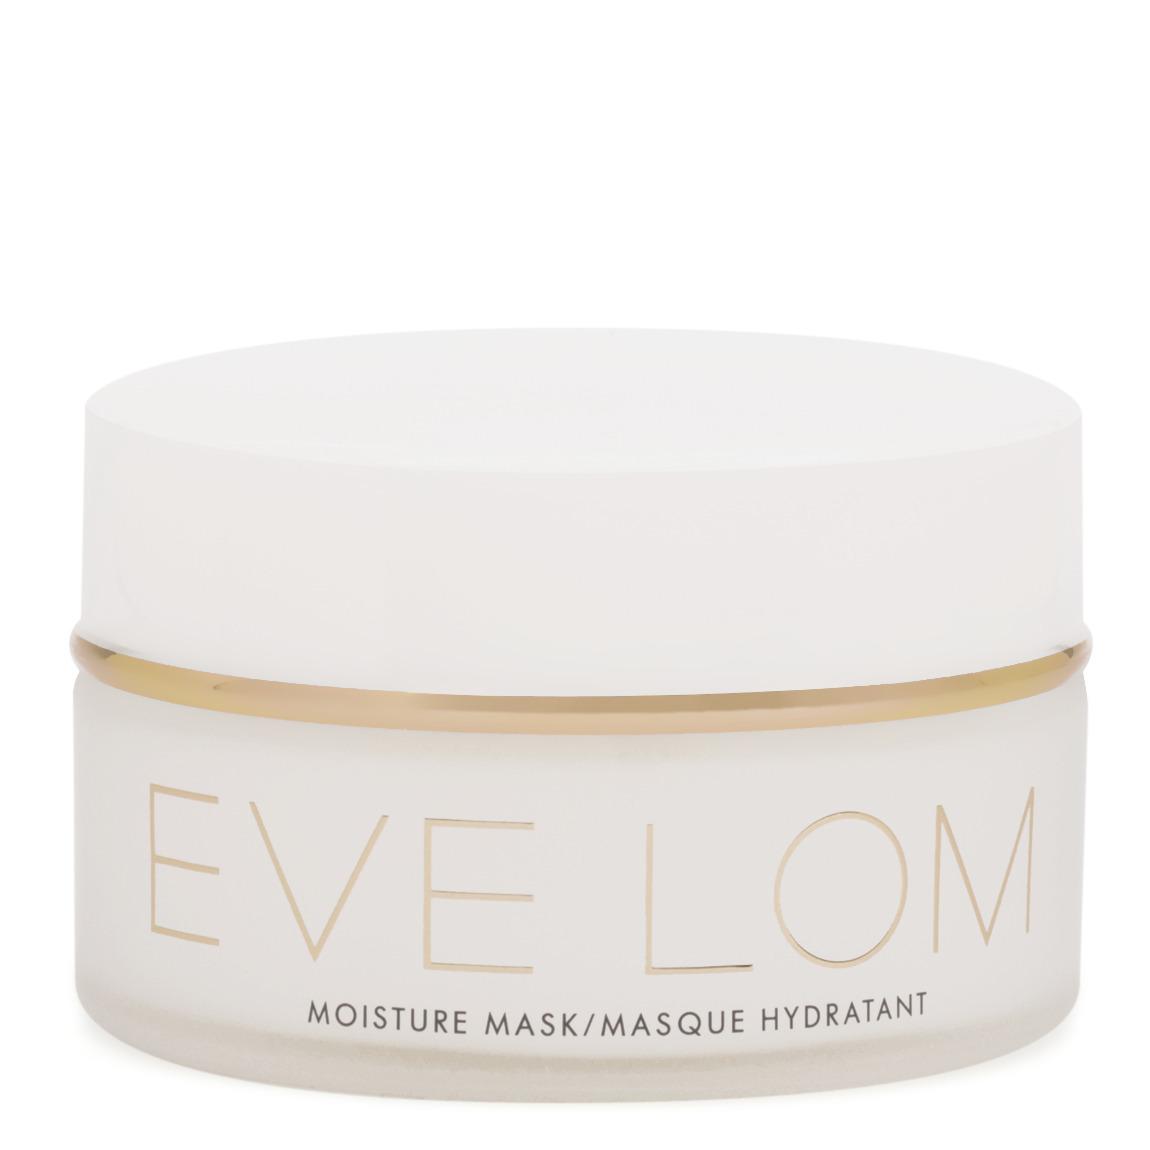 EVE LOM Moisture Mask alternative view 1 - product swatch.